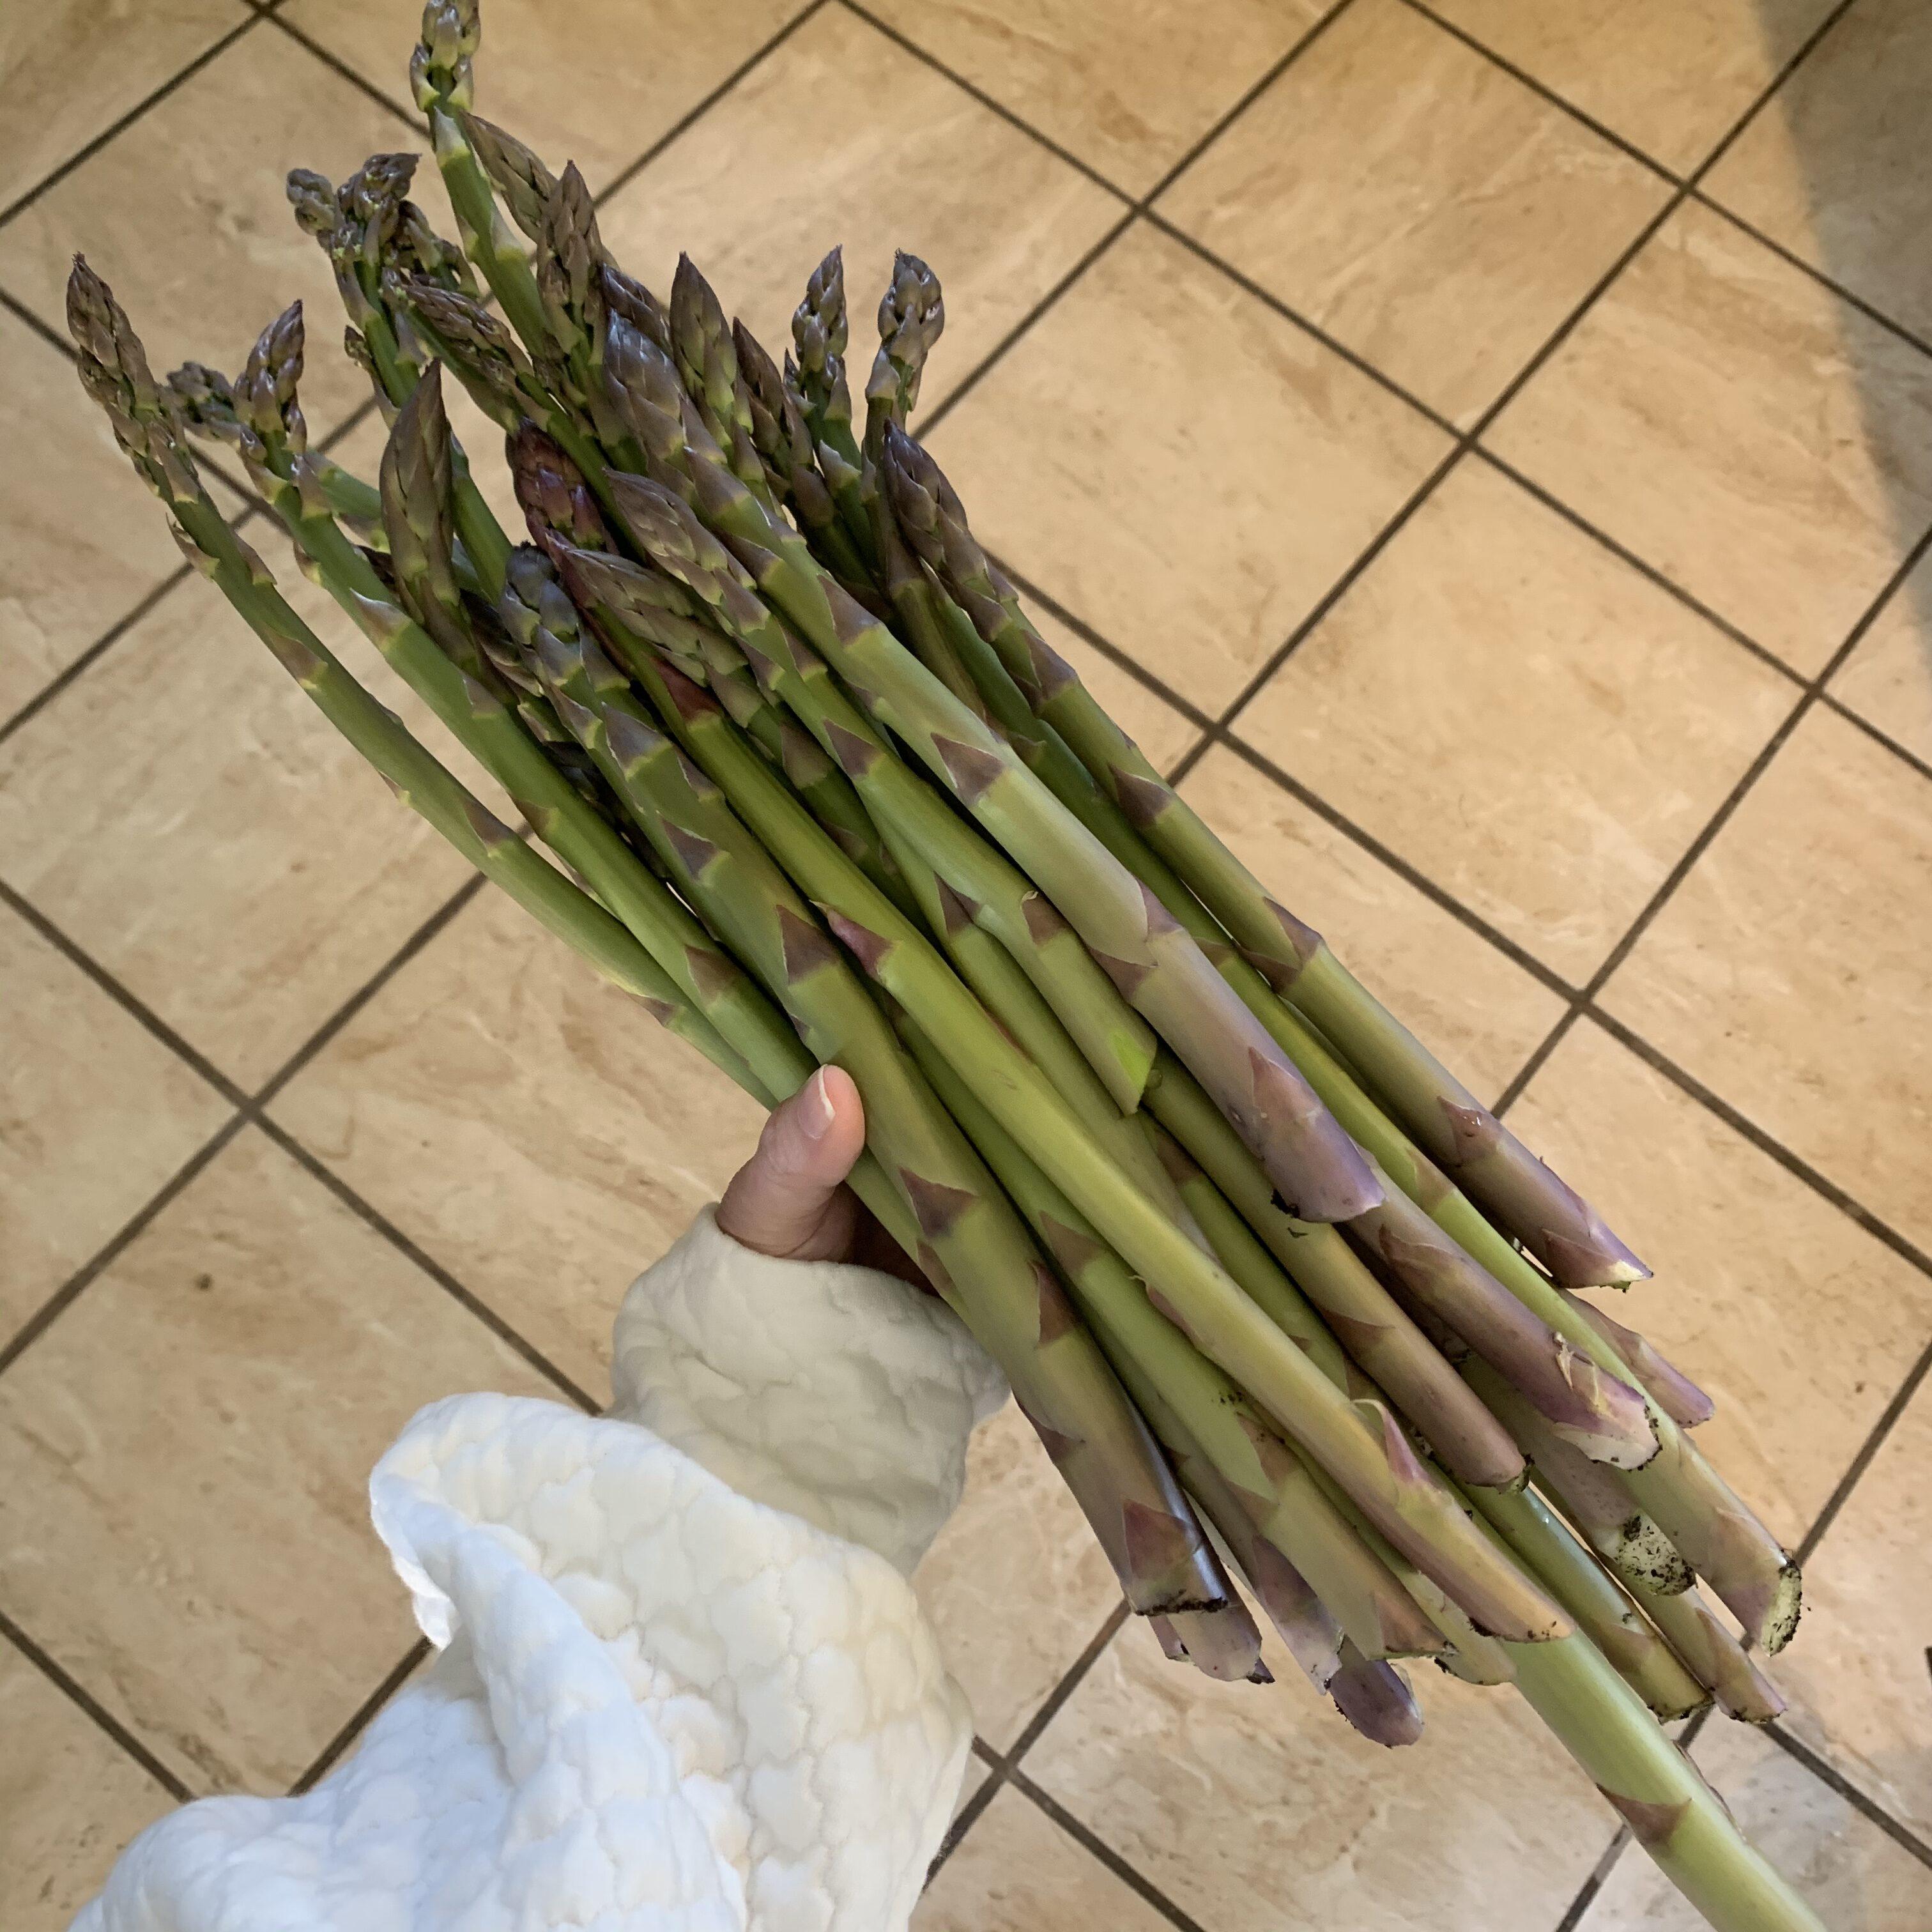 B24A7C15 9C13 4BE4 976B F0FEC57D7118 Lovely Asparagus!